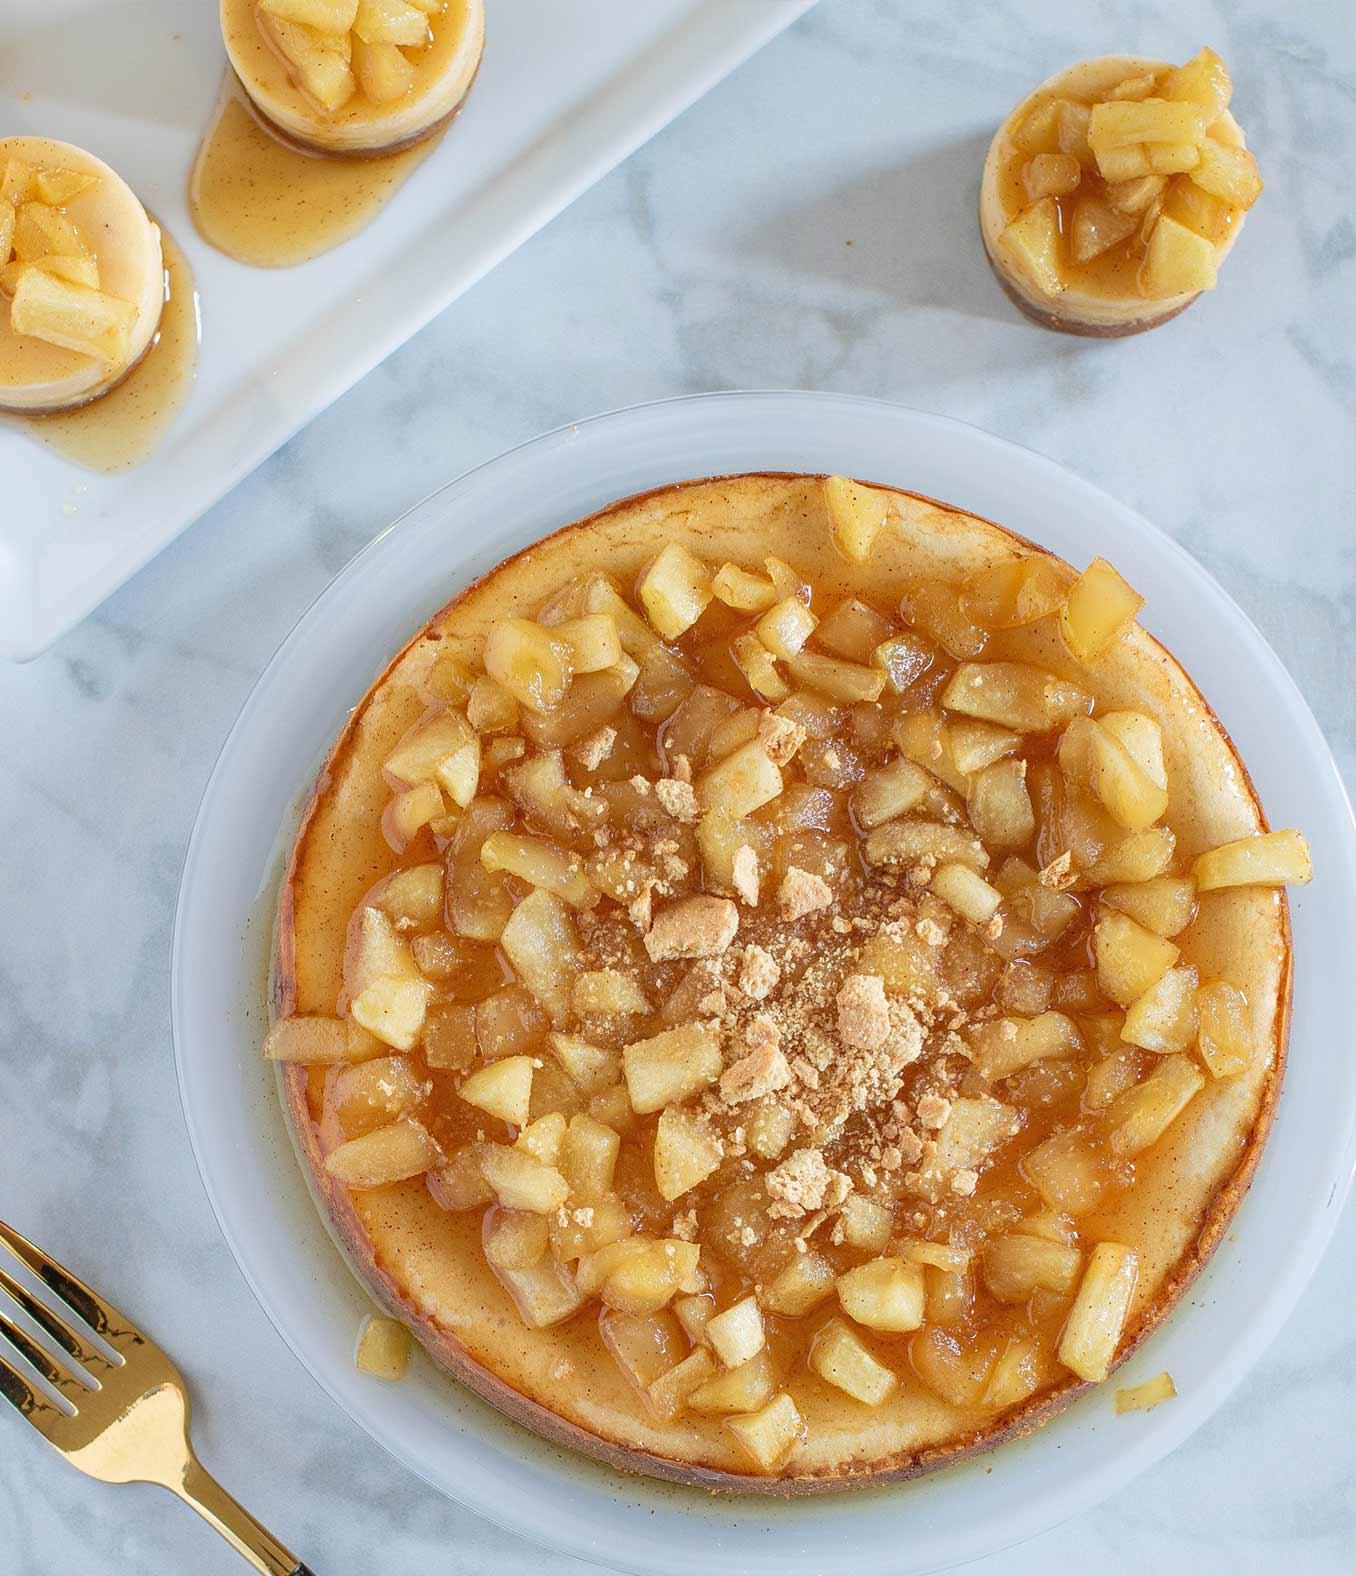 Caramel Apple Spice Cheesecake